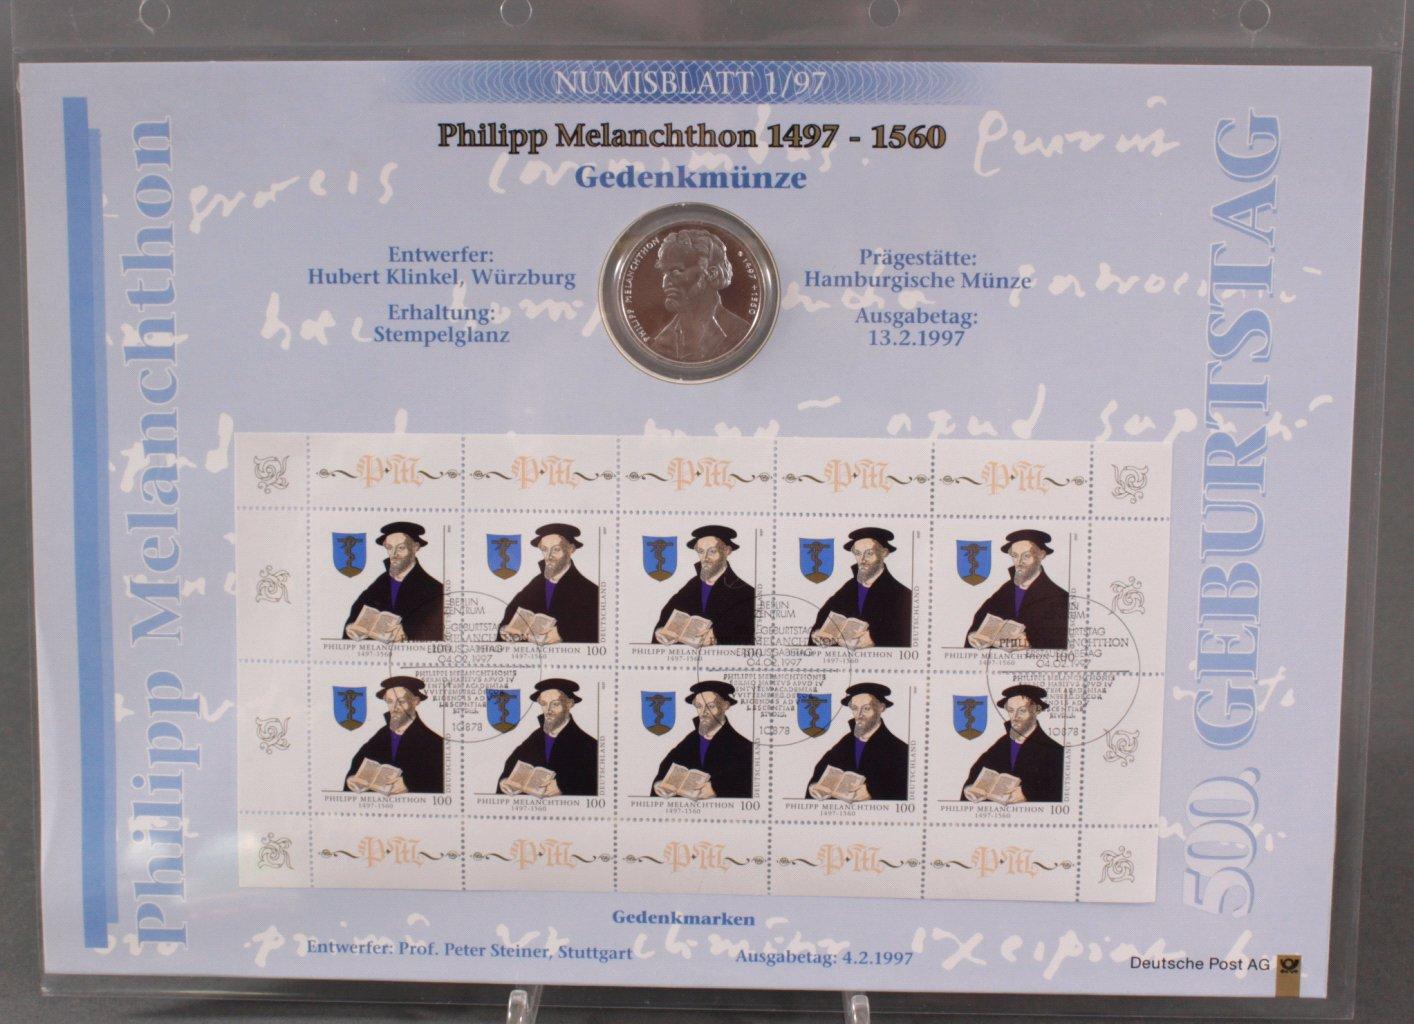 BUND NUMISBLATT 1/97 – PHILIPP MELANCHTHON